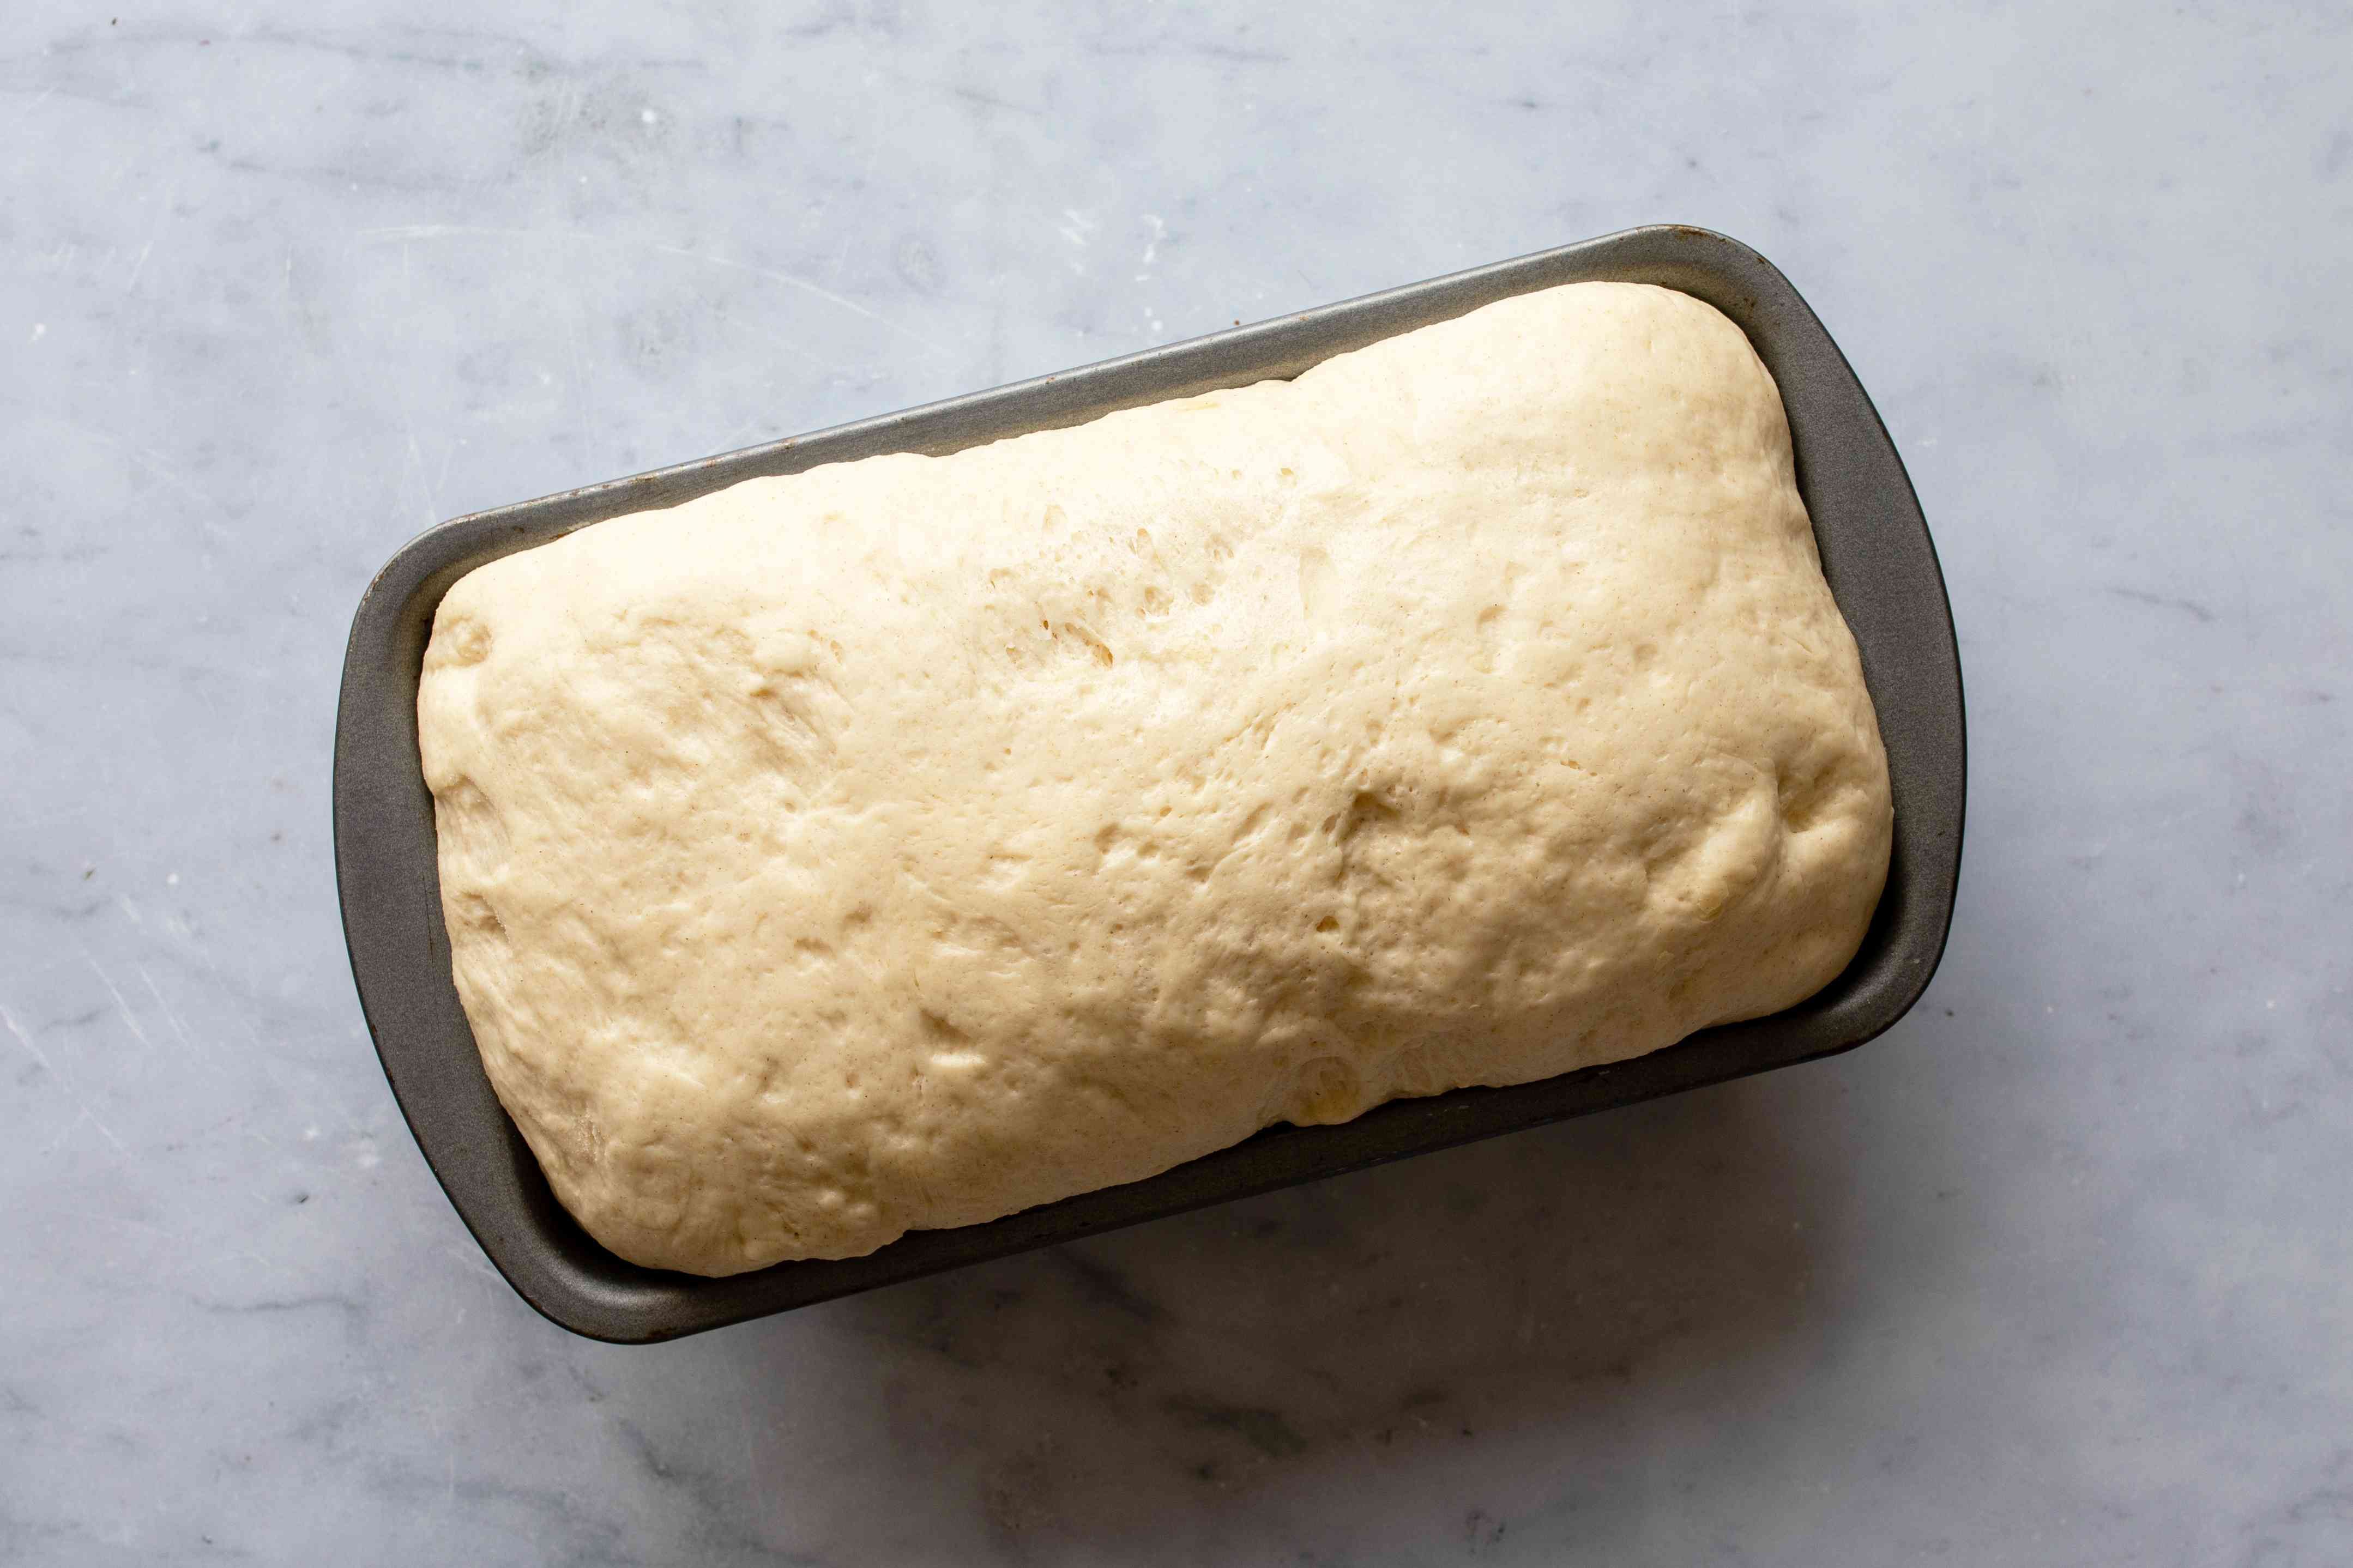 The risen dough in a metal bread pan